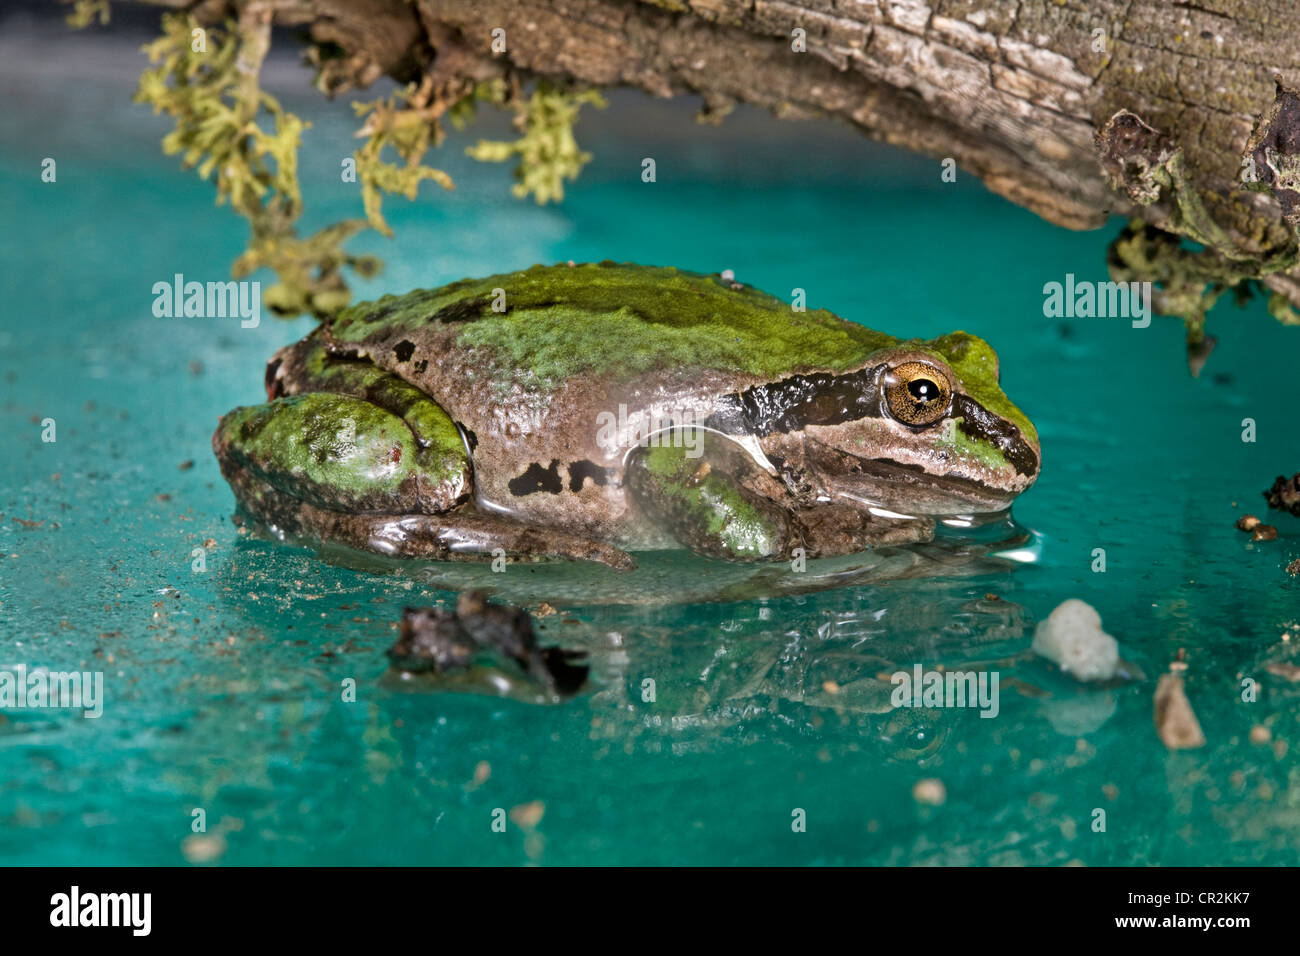 Pacific Tree Frog, Pseudacris regilla - Stock Image